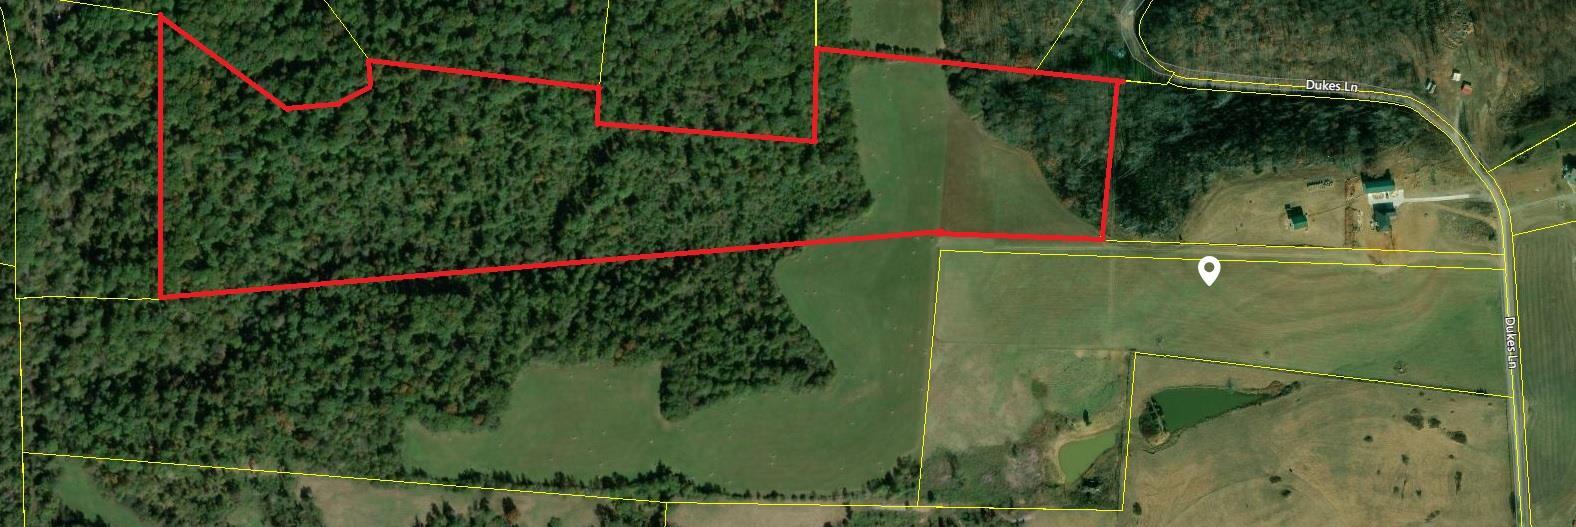 0 Dukes Ln, Kelso, TN 37348 - Kelso, TN real estate listing